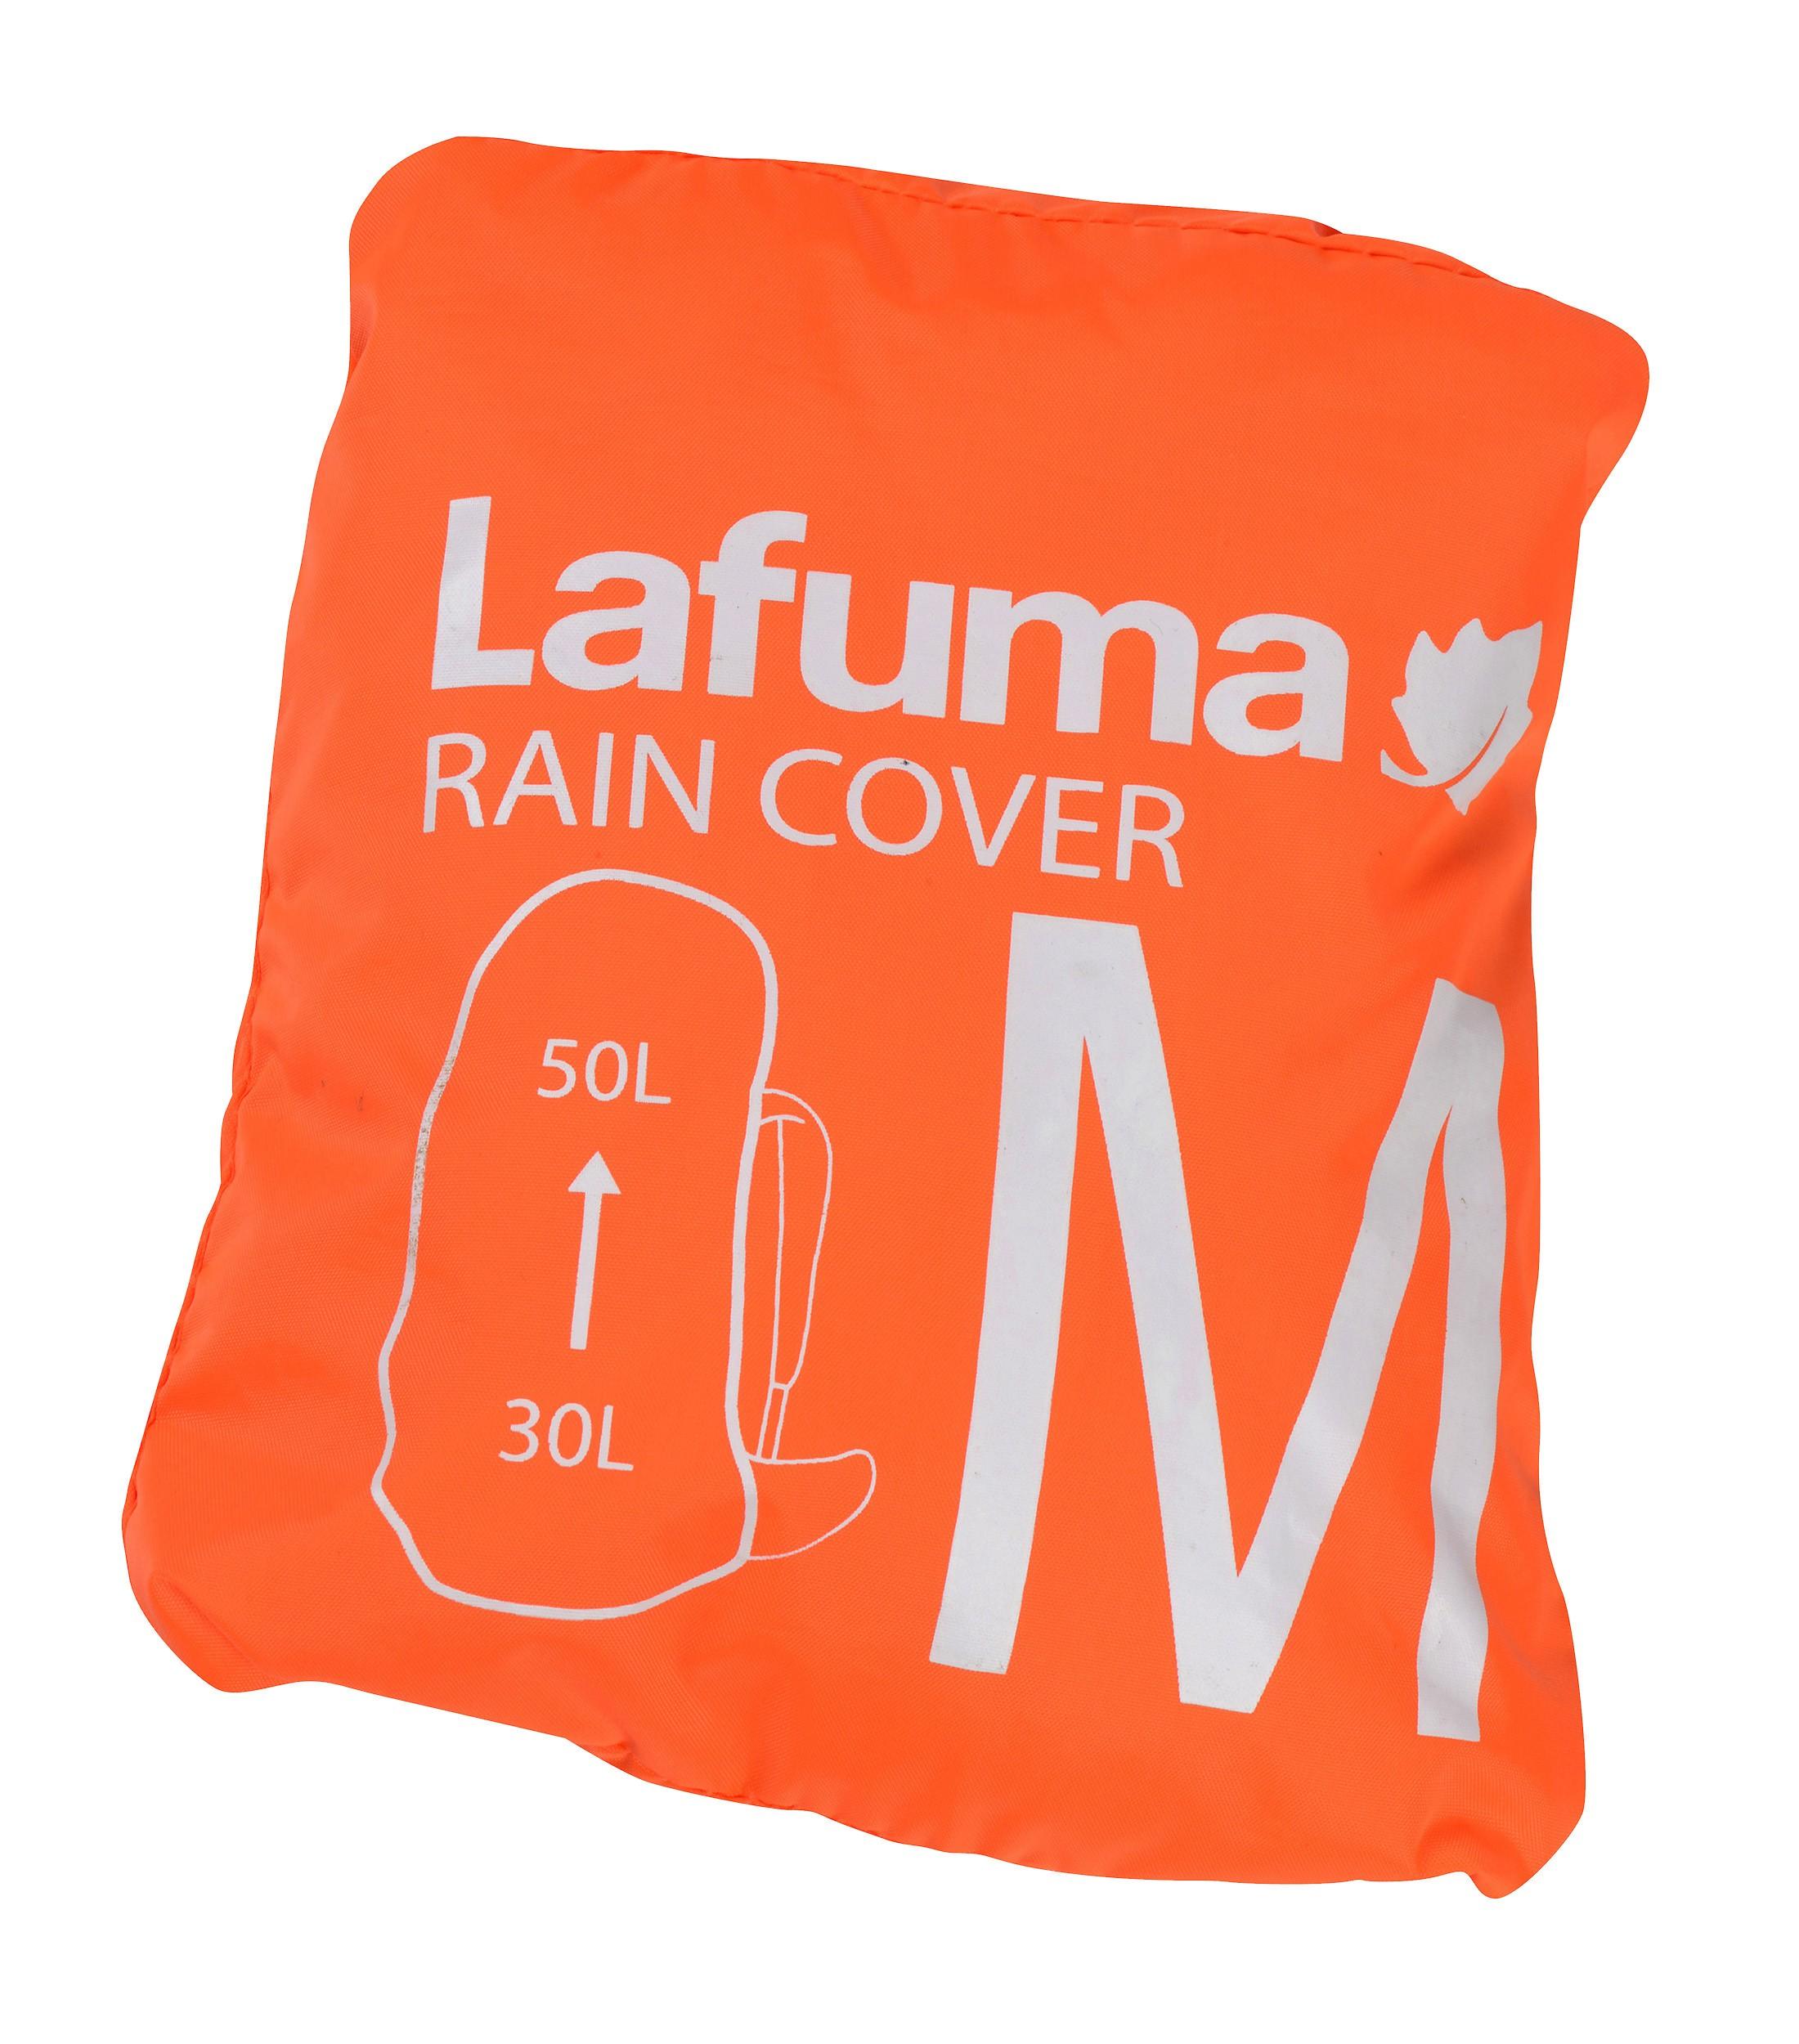 Lafuma Protection pluie Rain Cover - Taille M (30-50L) - Protection pluie